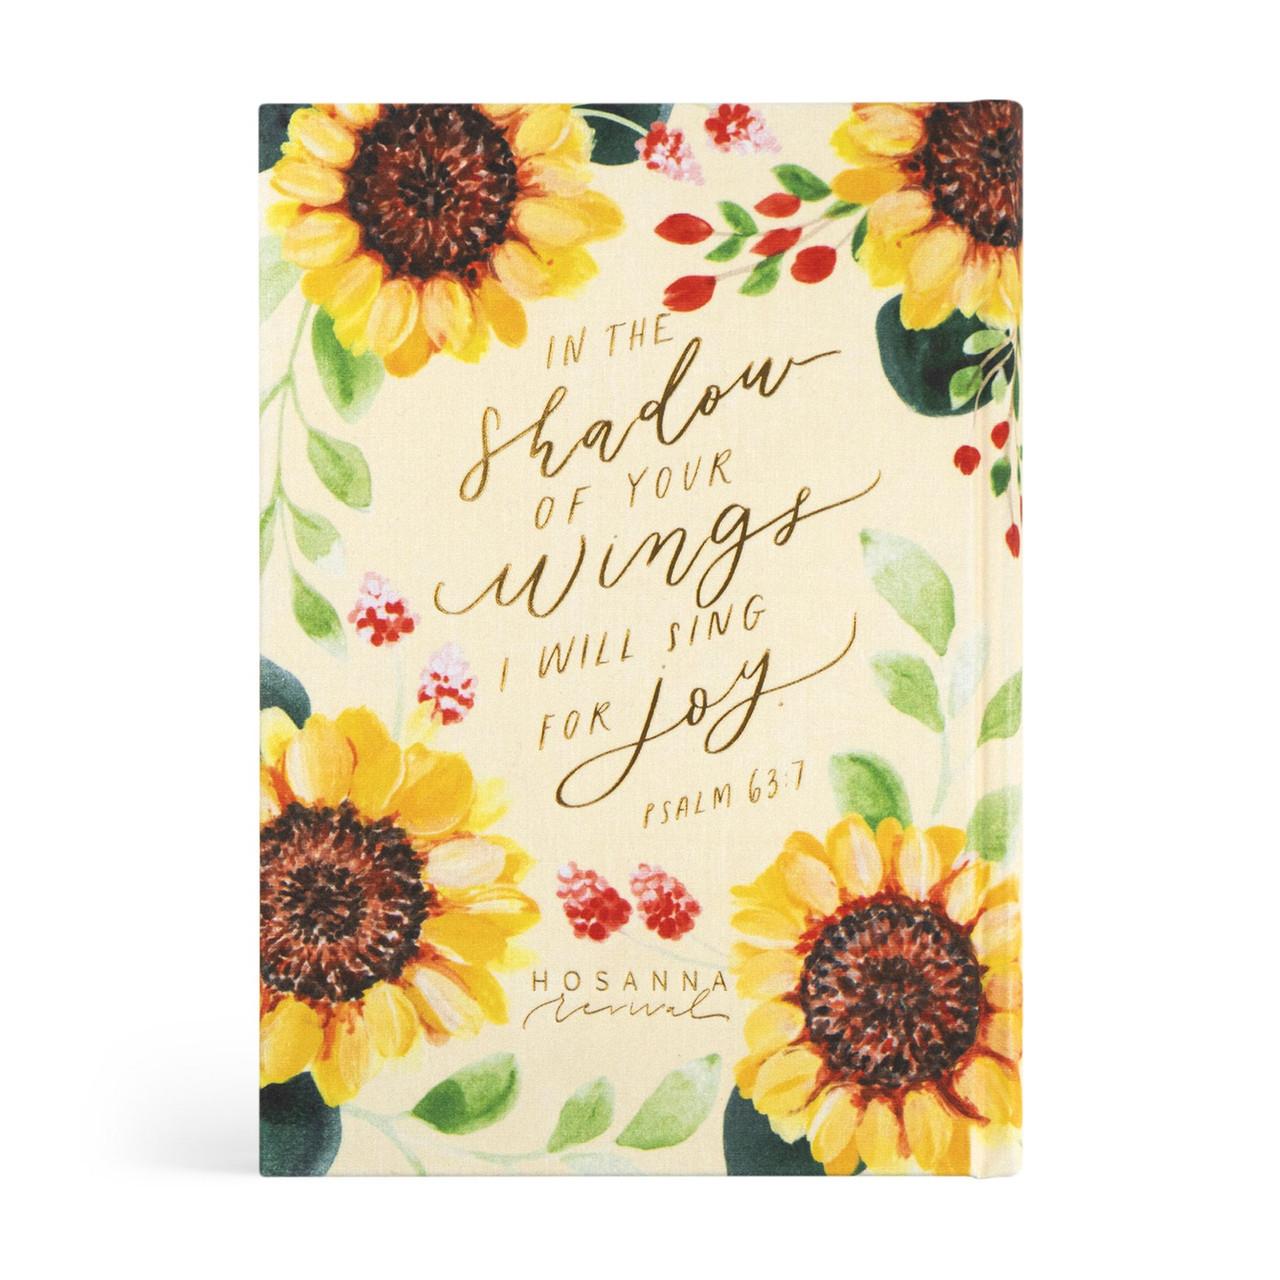 Hosanna Revival Bible - Savannah Theme - ESV Large Print Journaling Bible